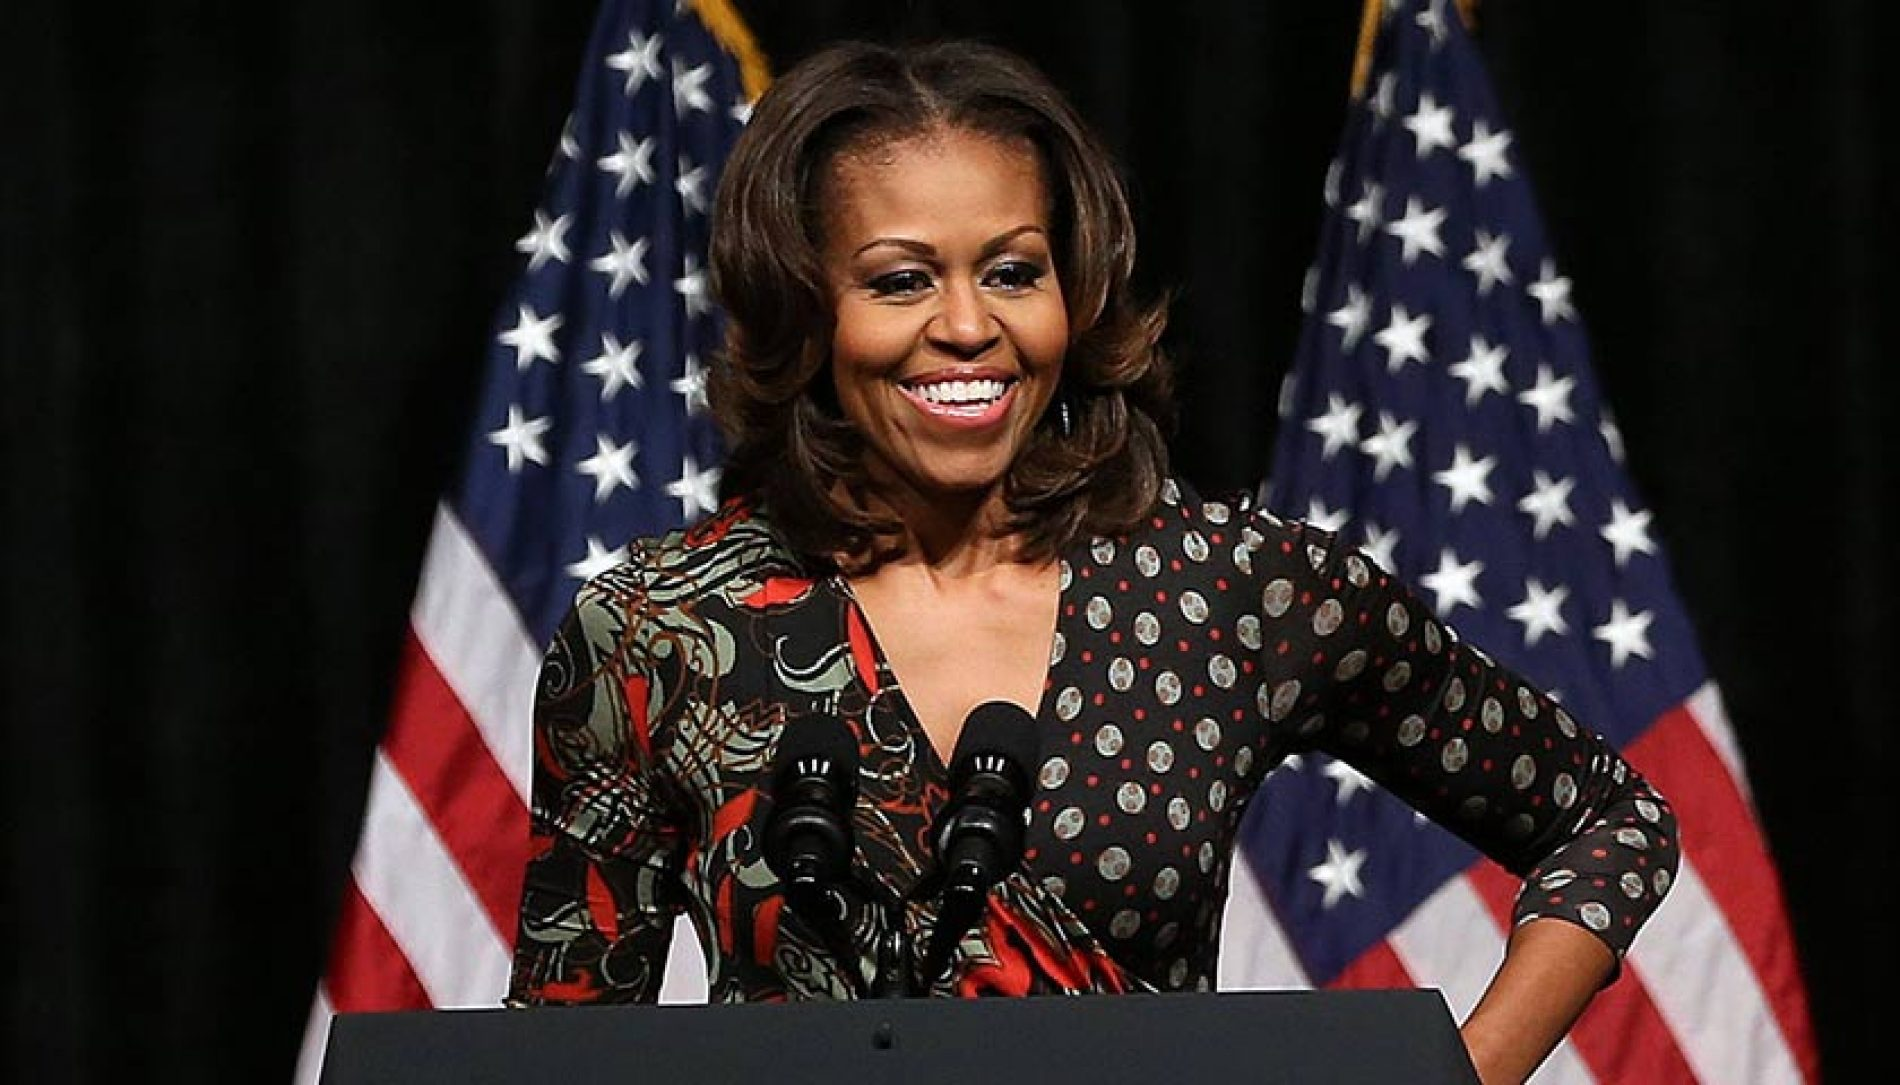 Garotinha se veste como Michelle Obama e recebe nota A+ via Twitter